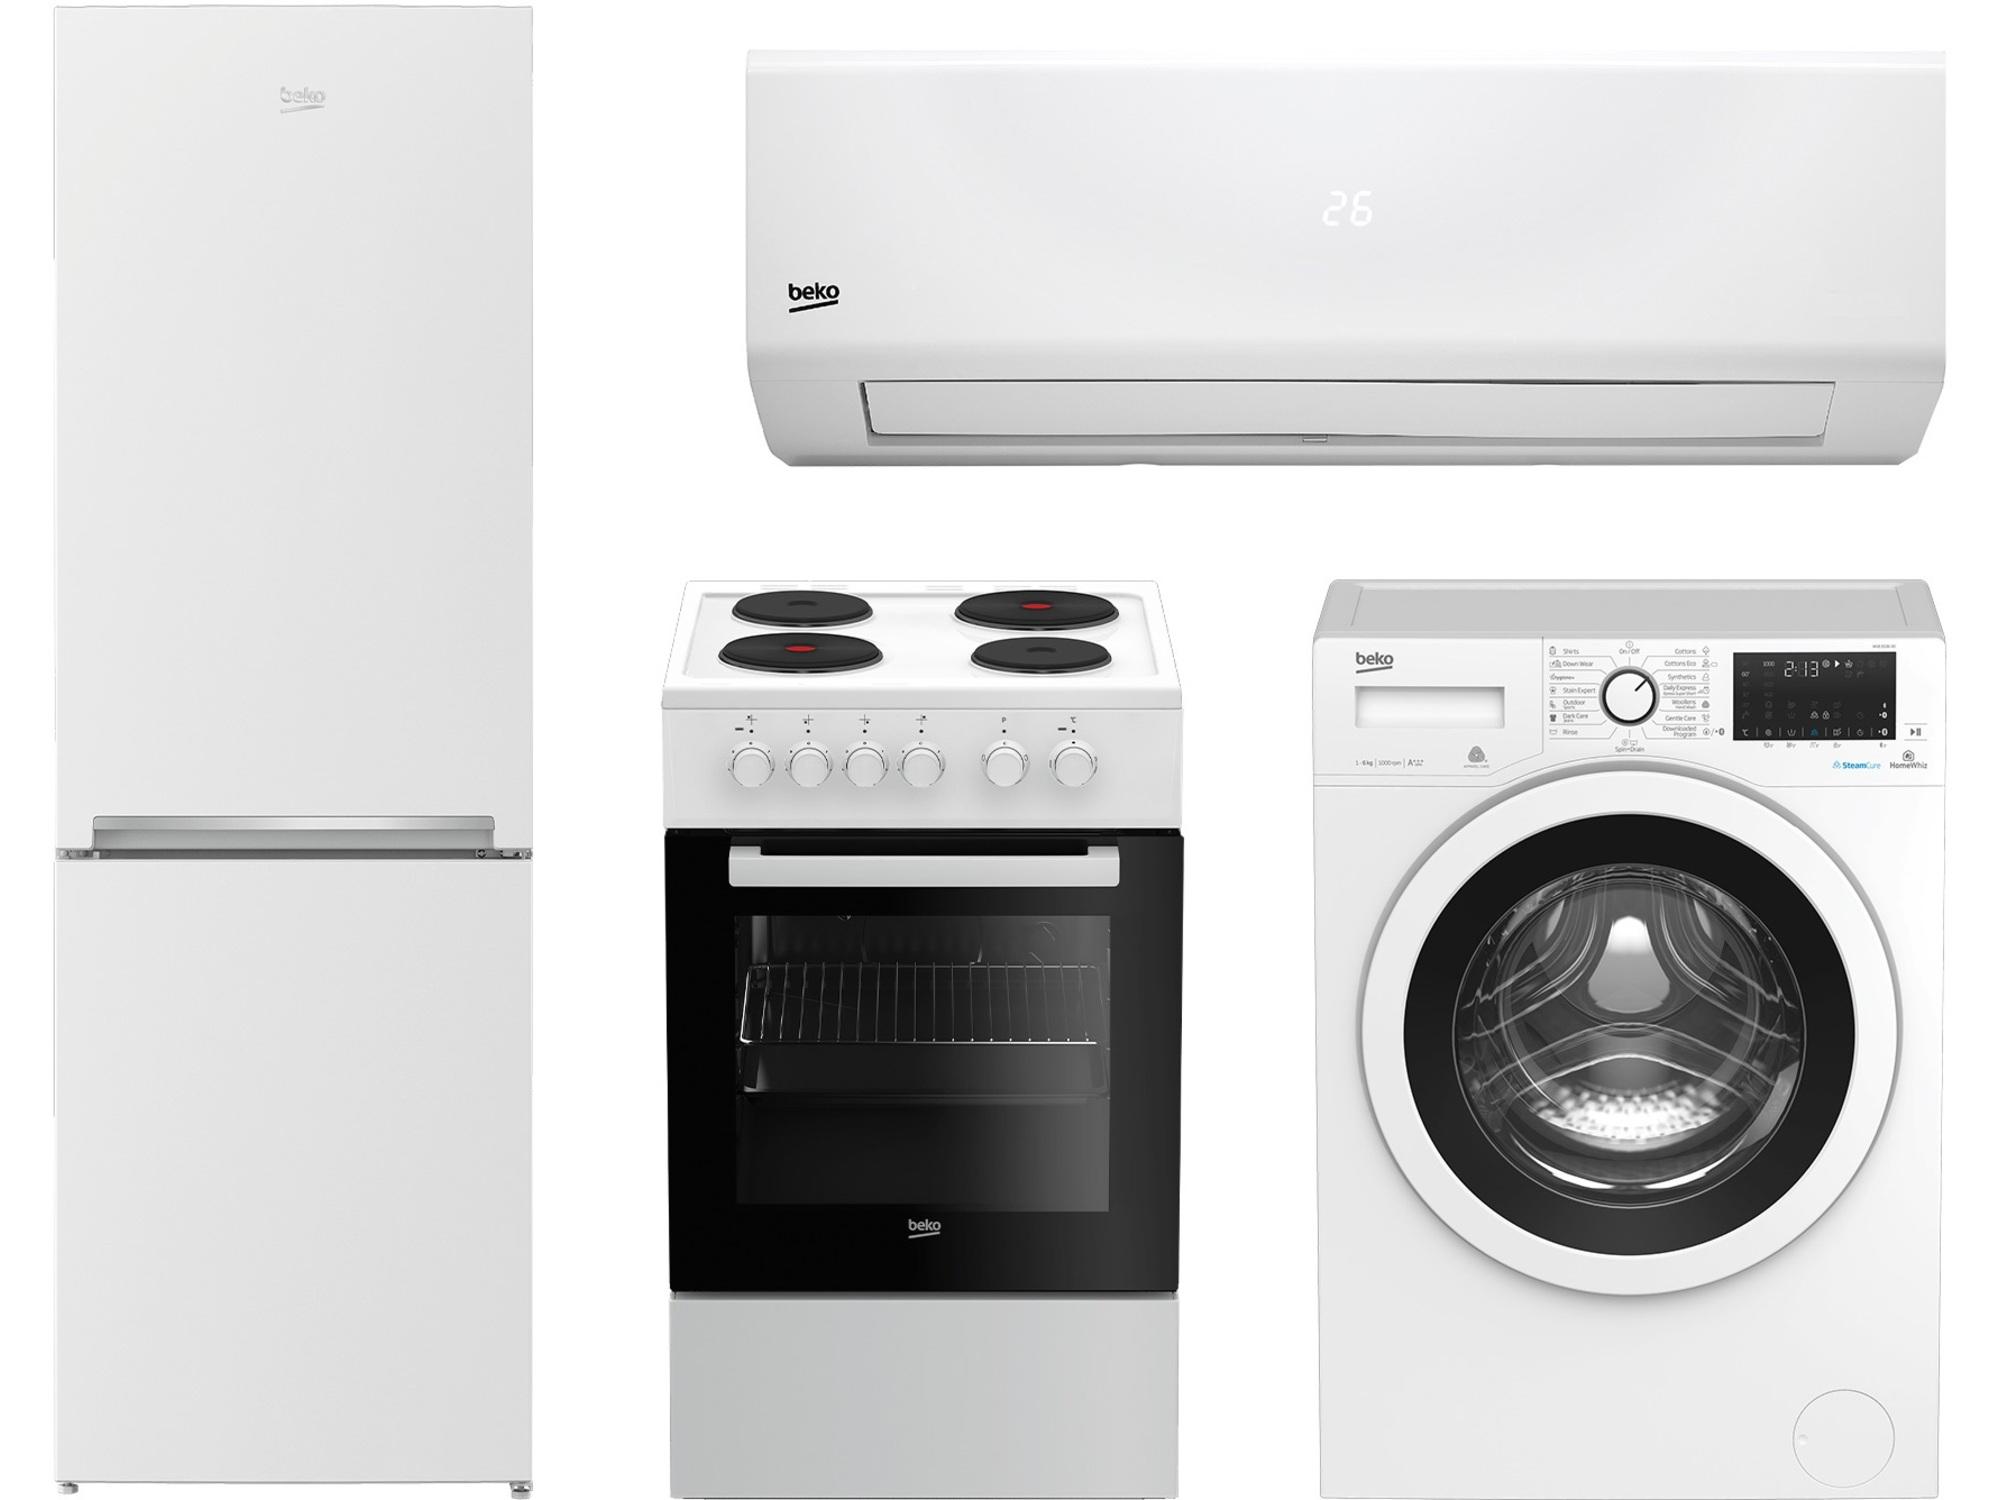 Beko Frižider, Šporet, Mašina za pranje veša + Klima uređaj